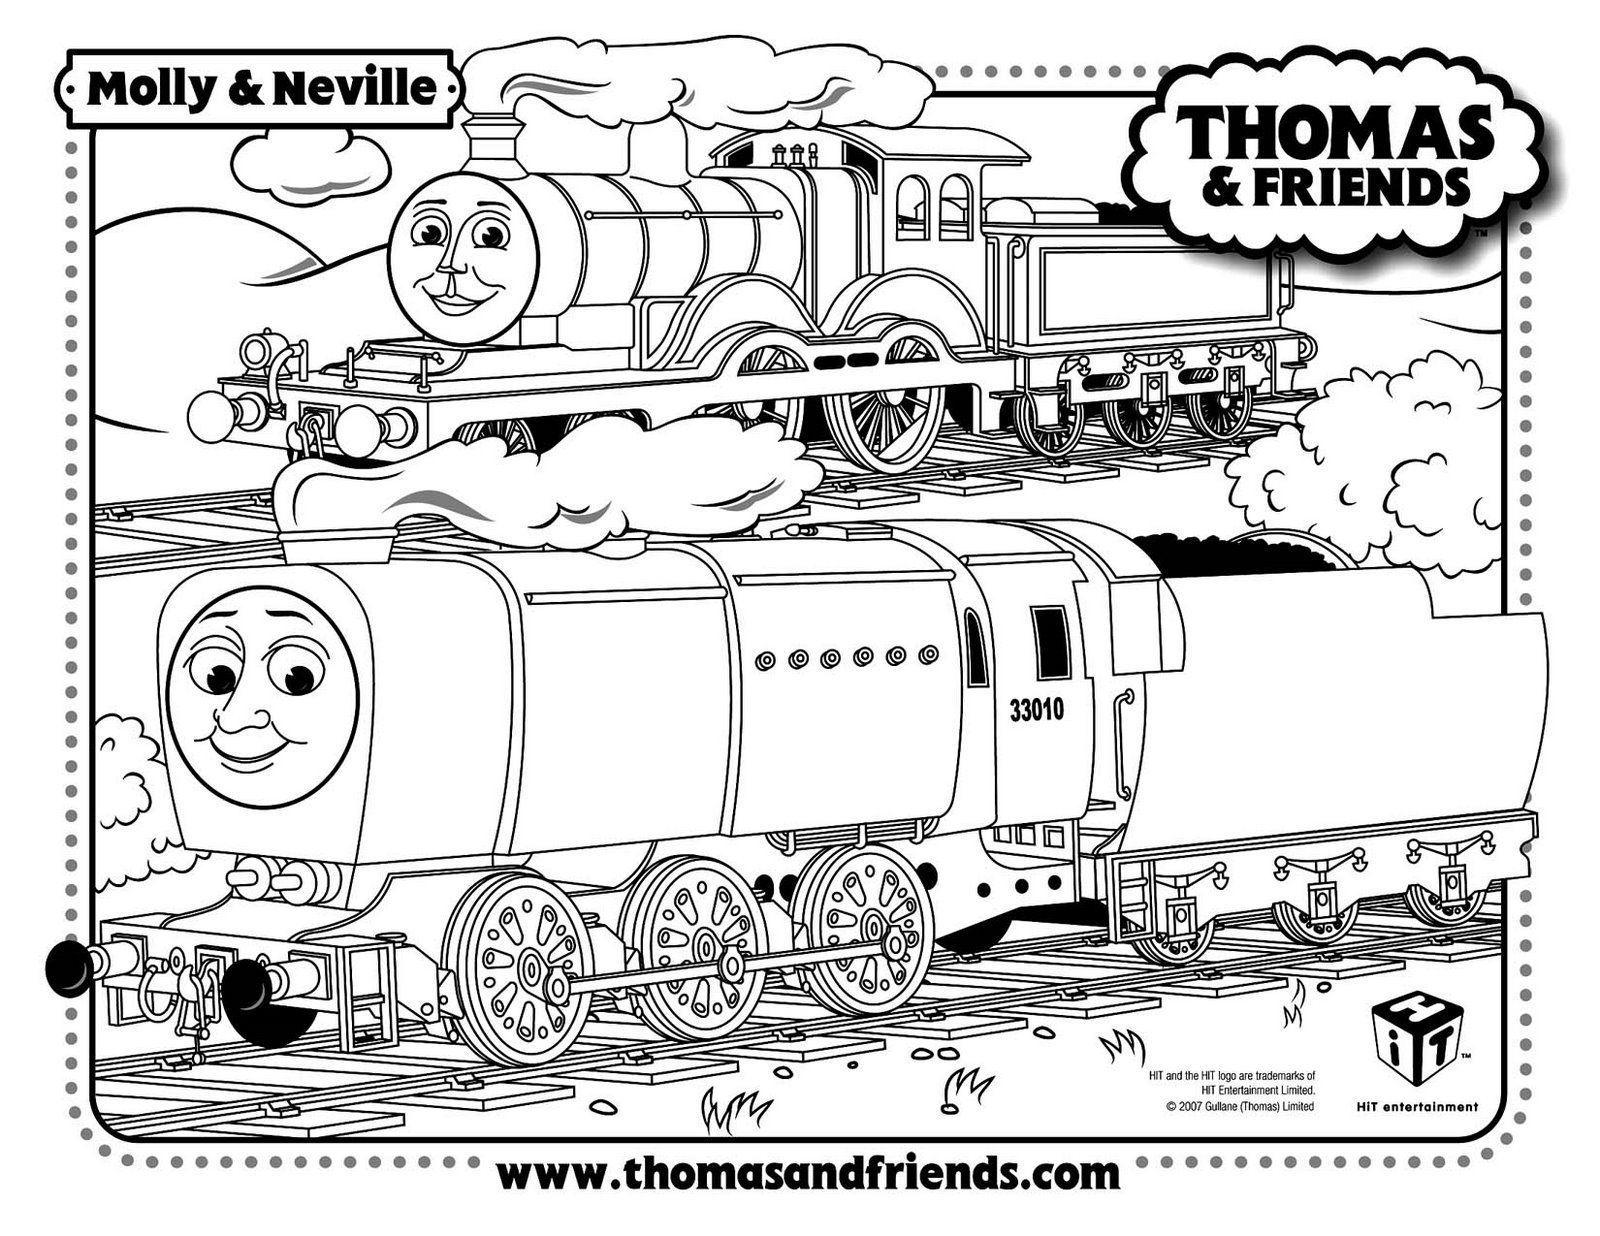 Thomas The Tank Engine Molly